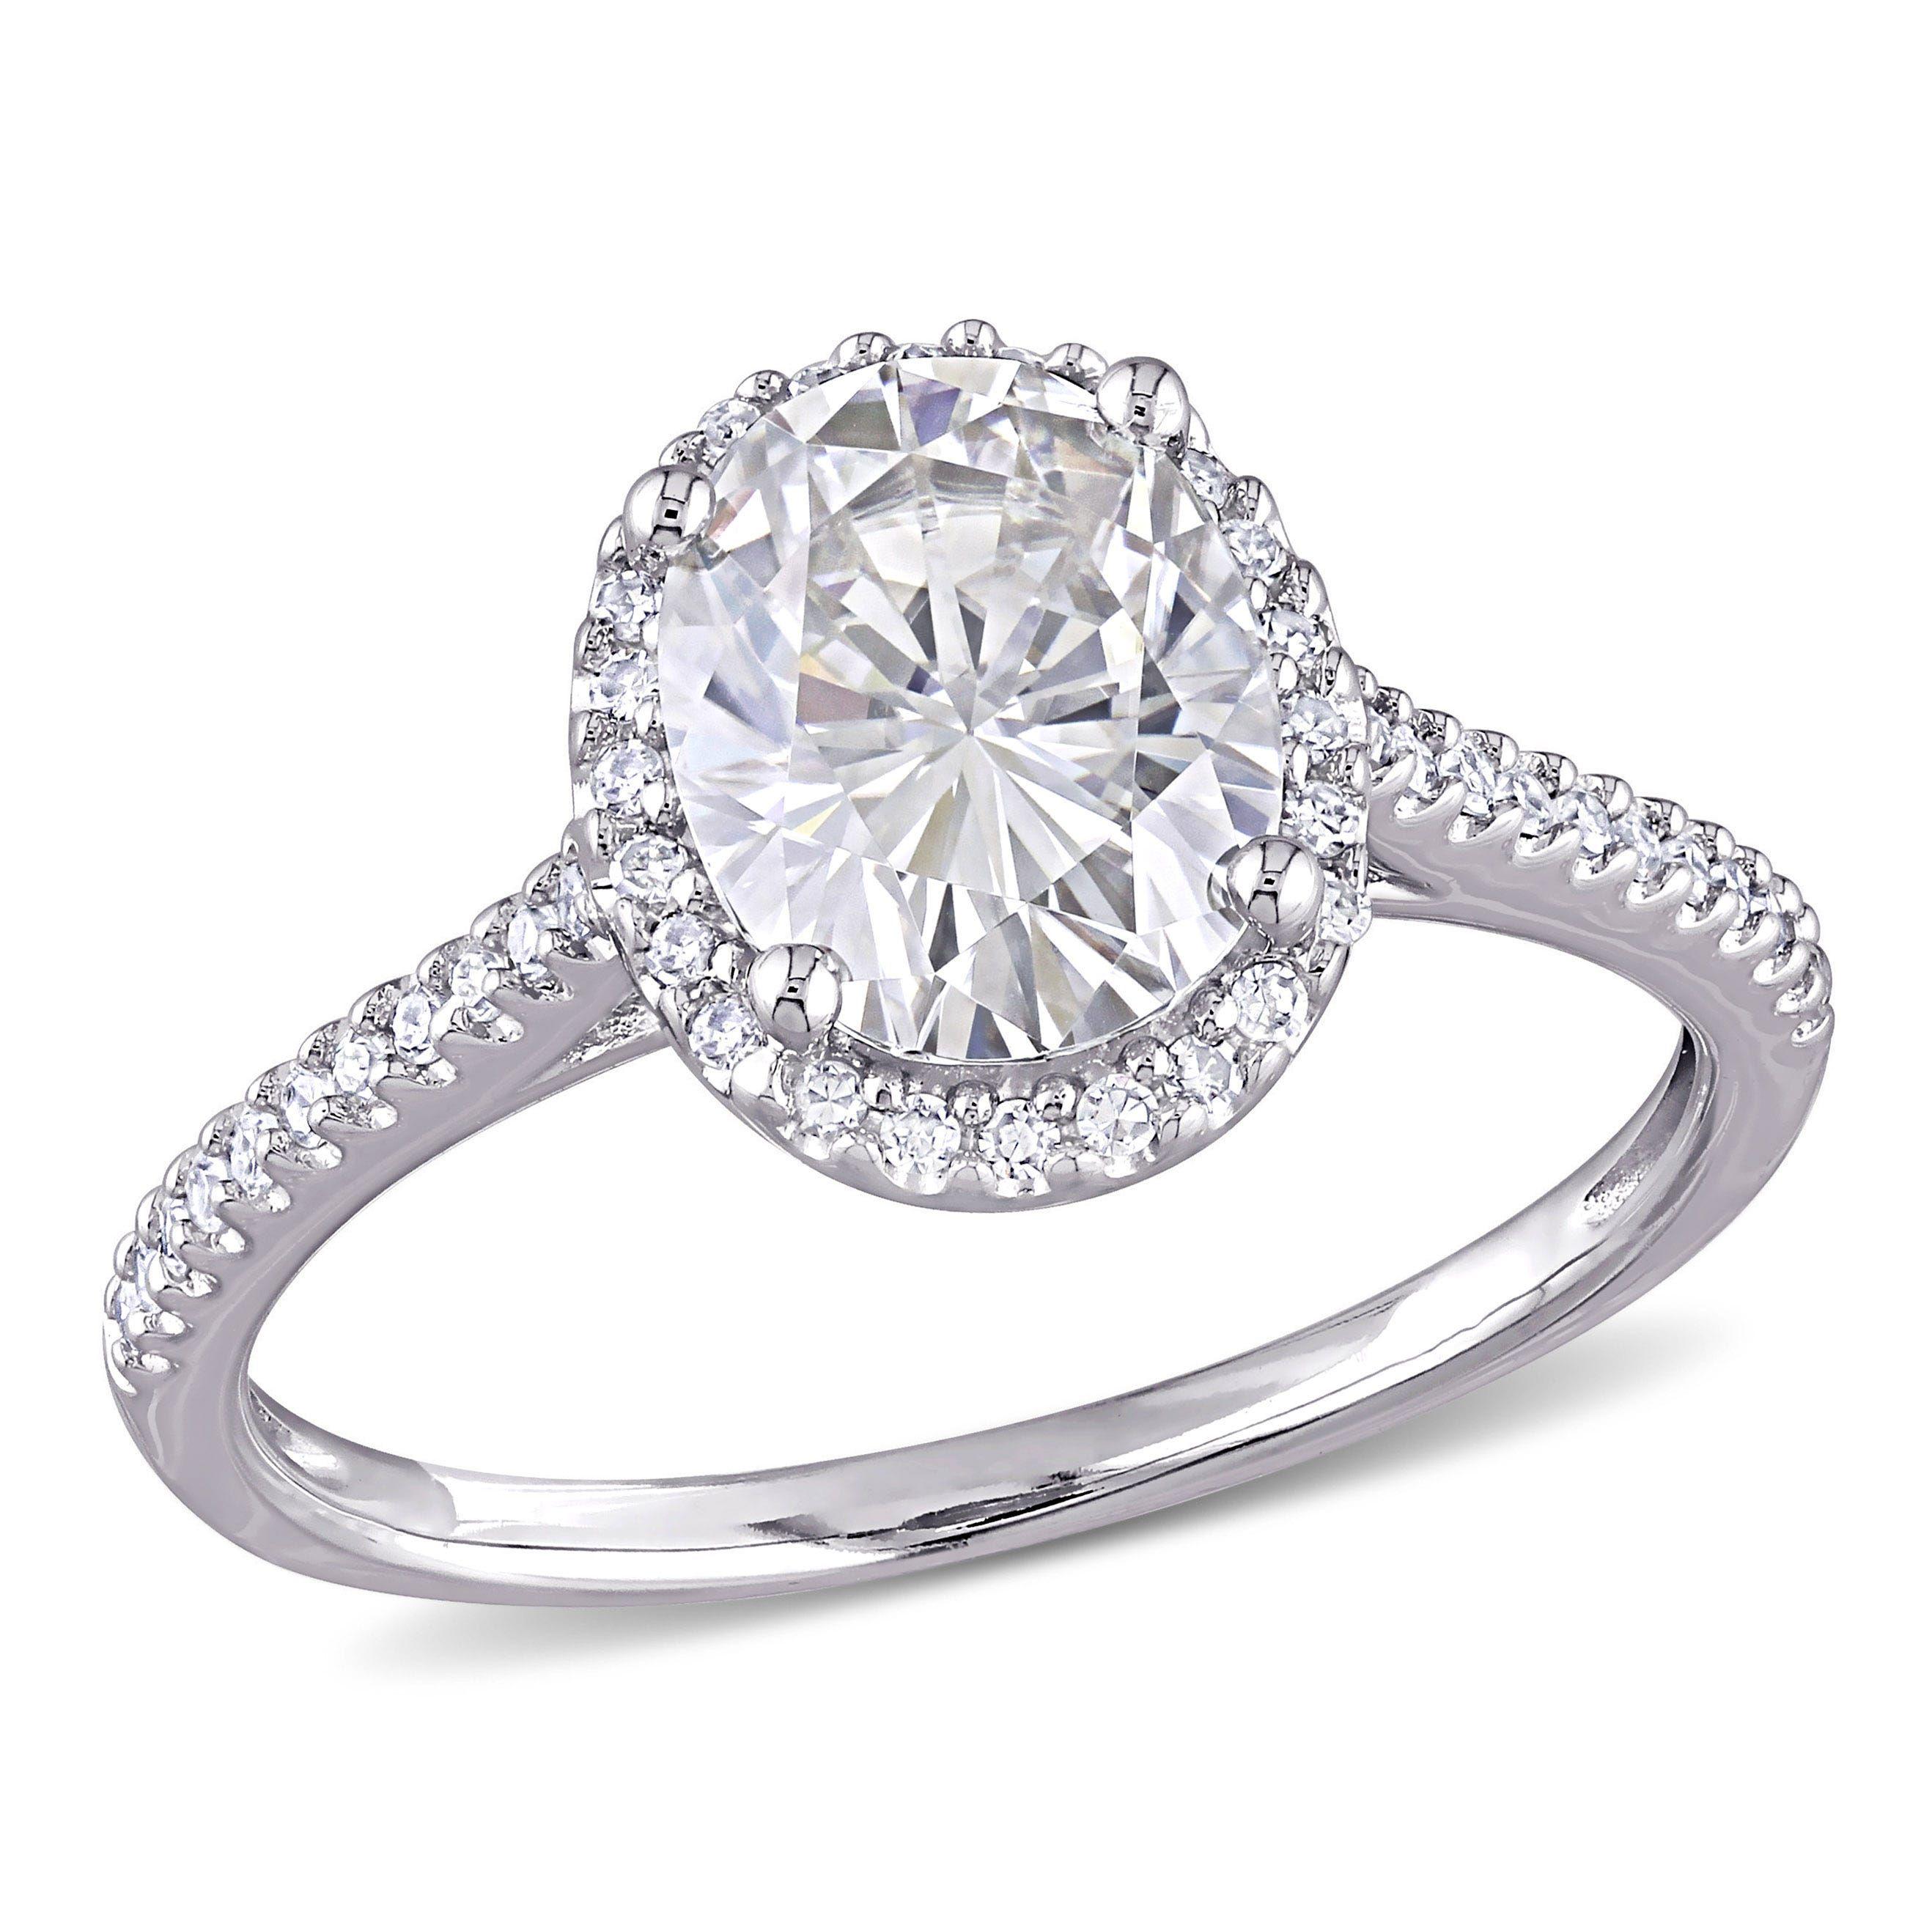 Moissanite and Diamond Engagement Ring in 14k White Gold